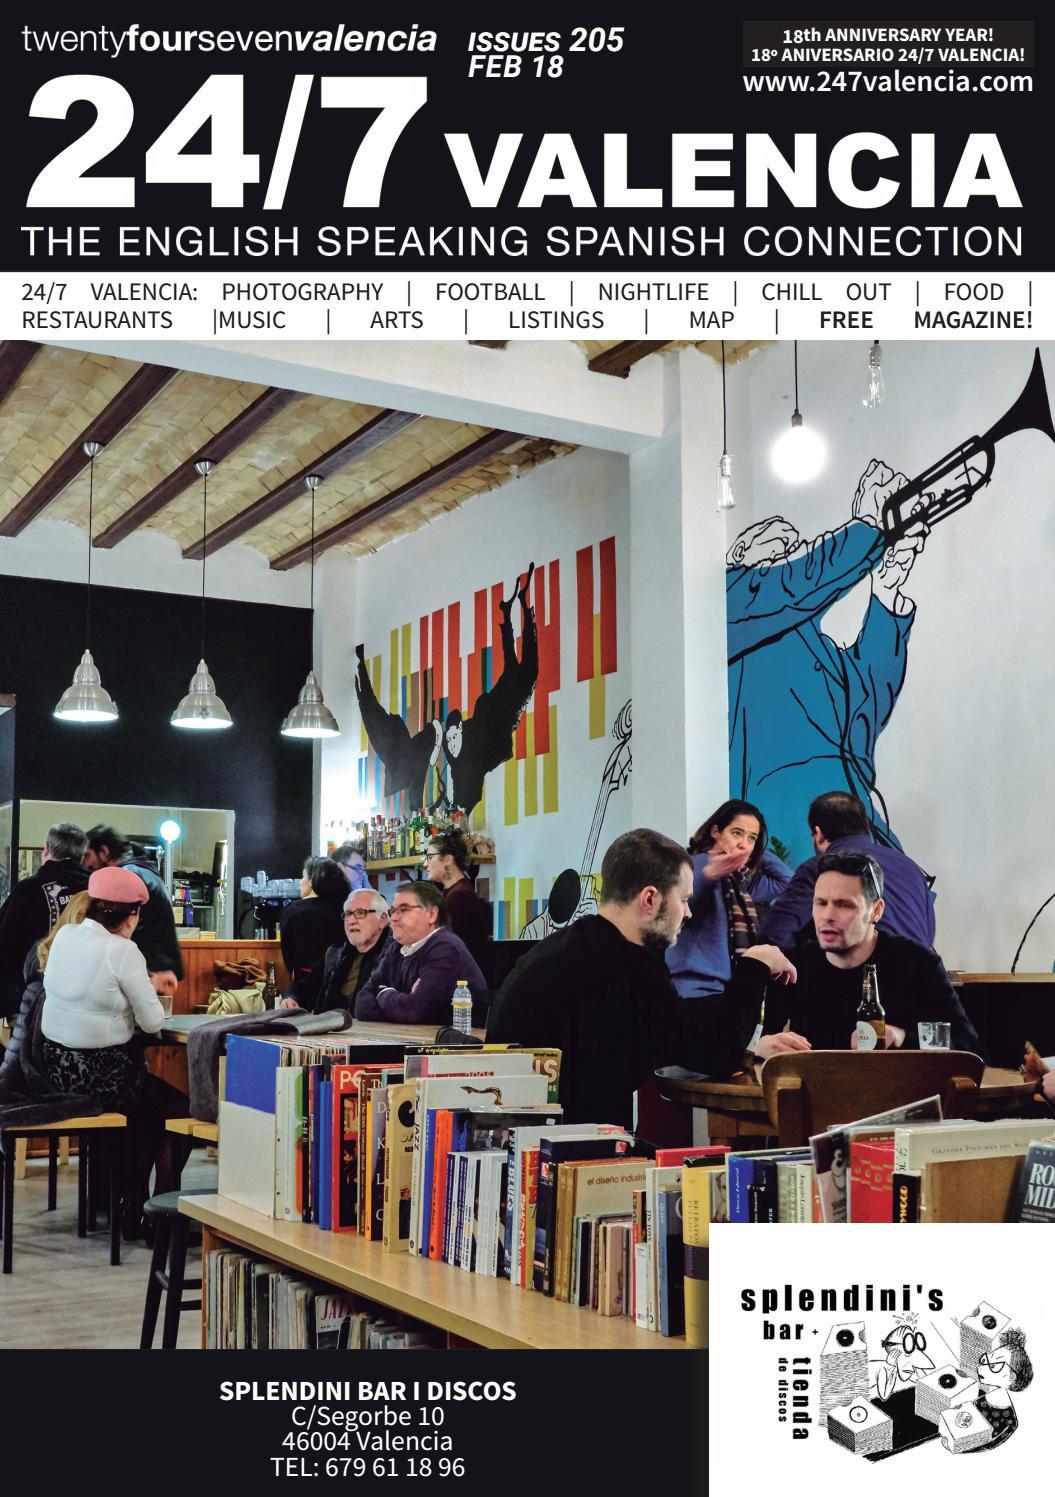 Feb 2018 24 7 Valencia Magazine By 247 Valencia Issuu